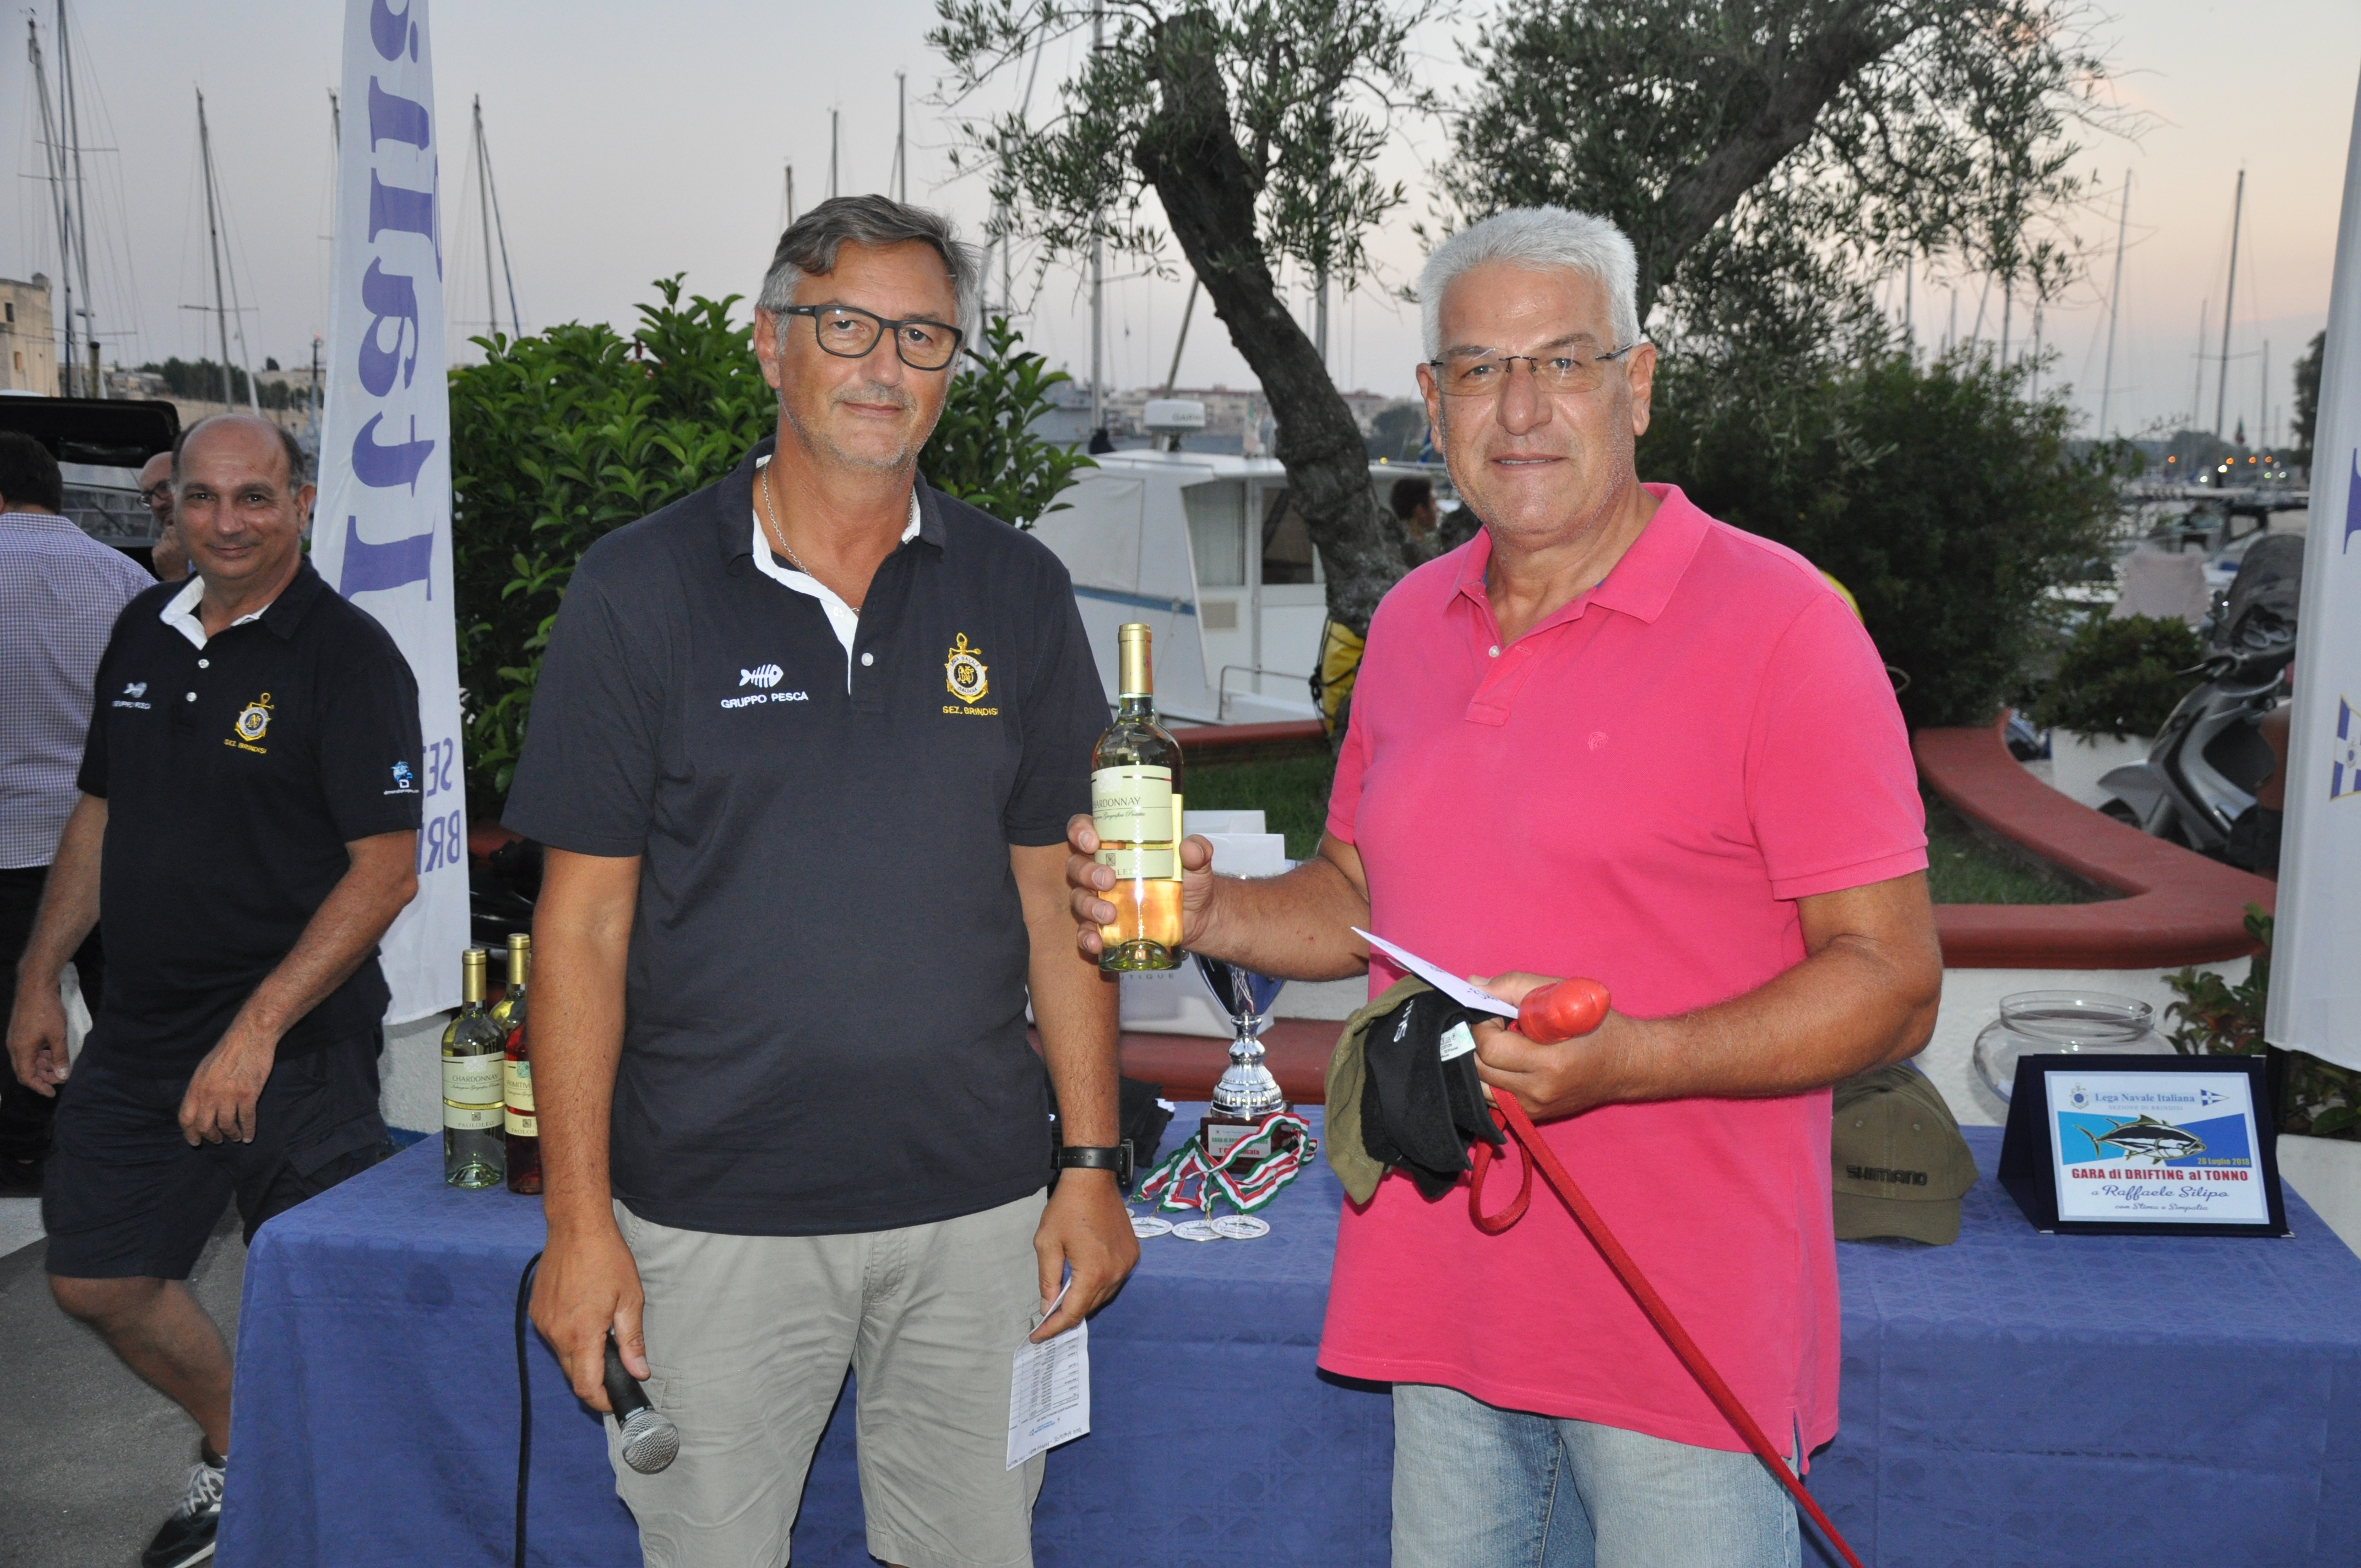 premiazione drifting al tonno 2018 (3)